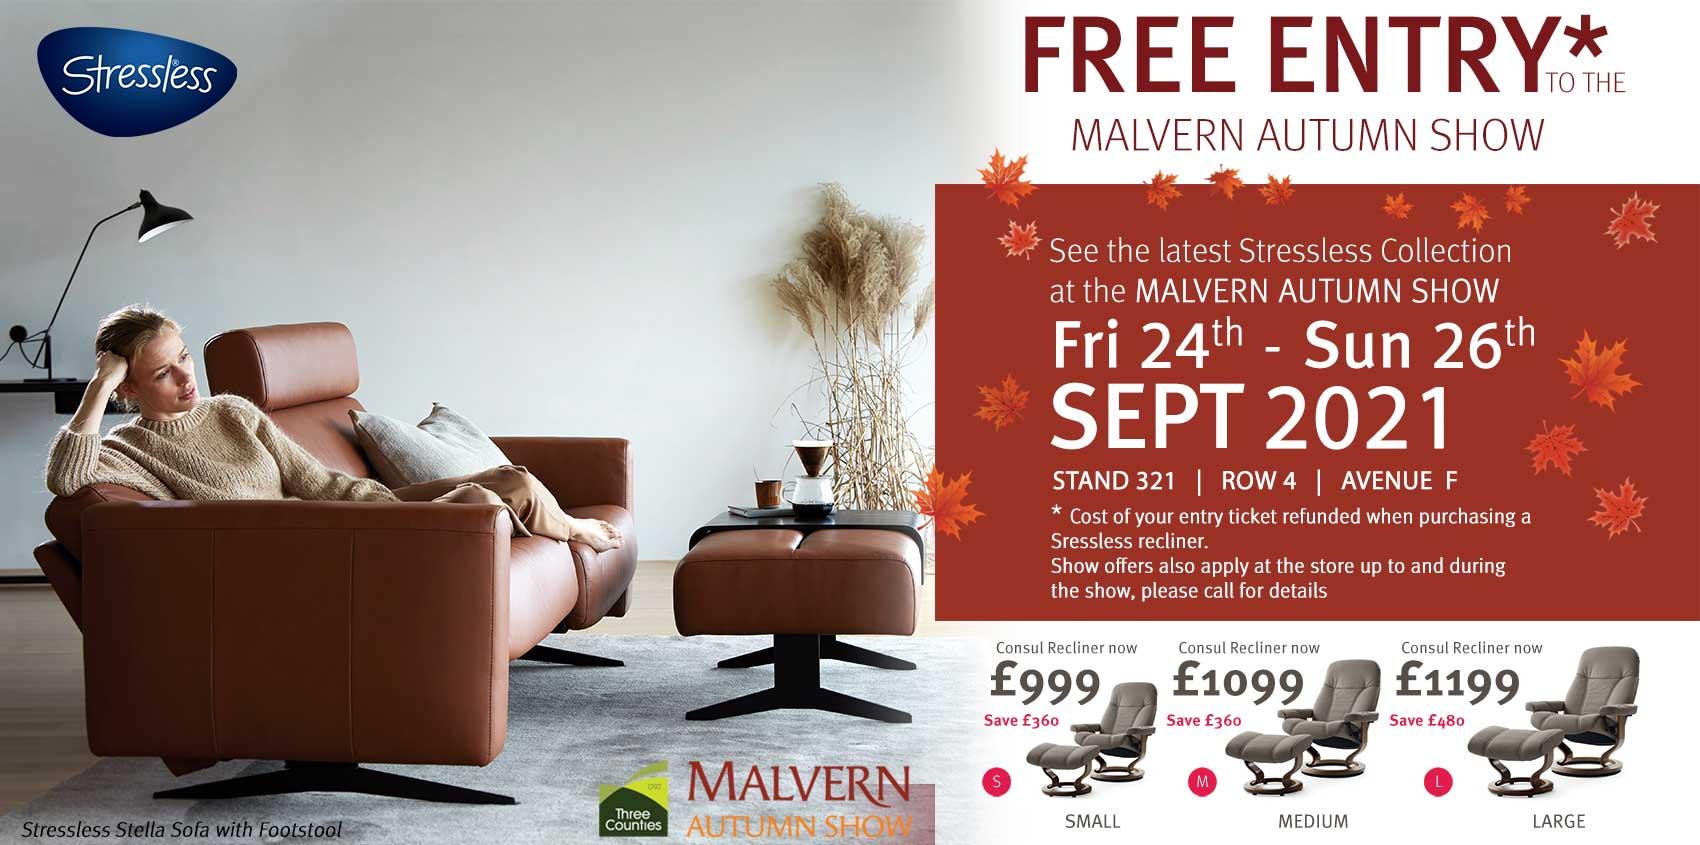 Insitu at the Malvern Autumn Show